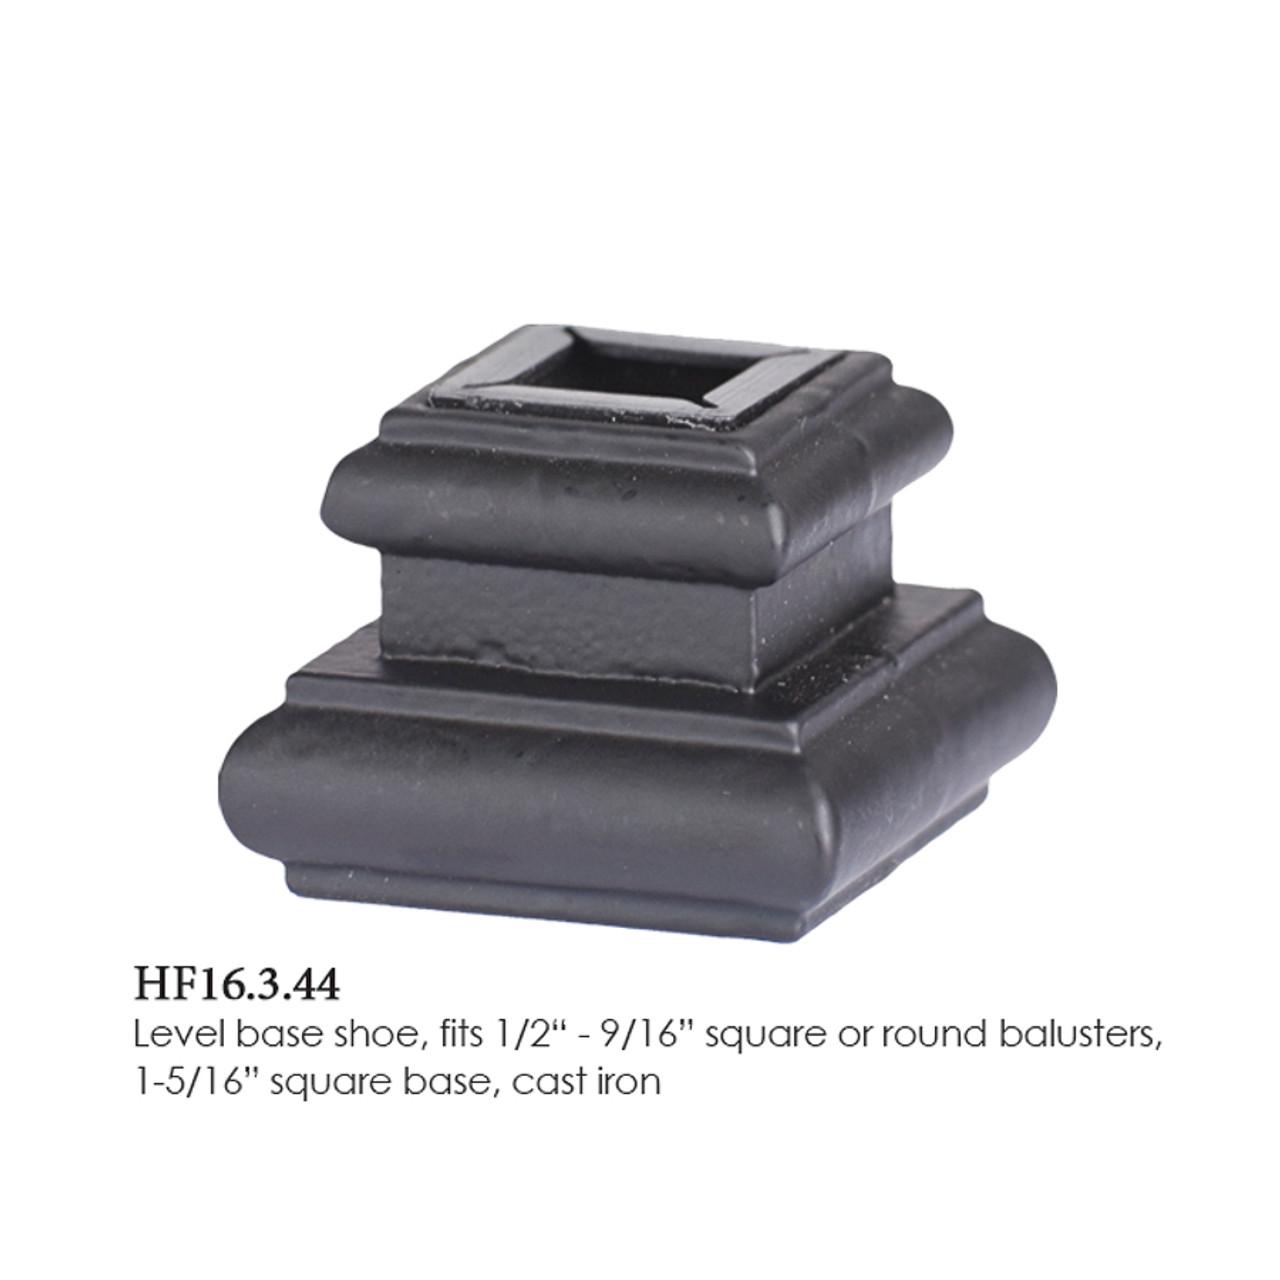 HF16.3.44 Adjustable Small Solid Iron Flat Shoe (2)